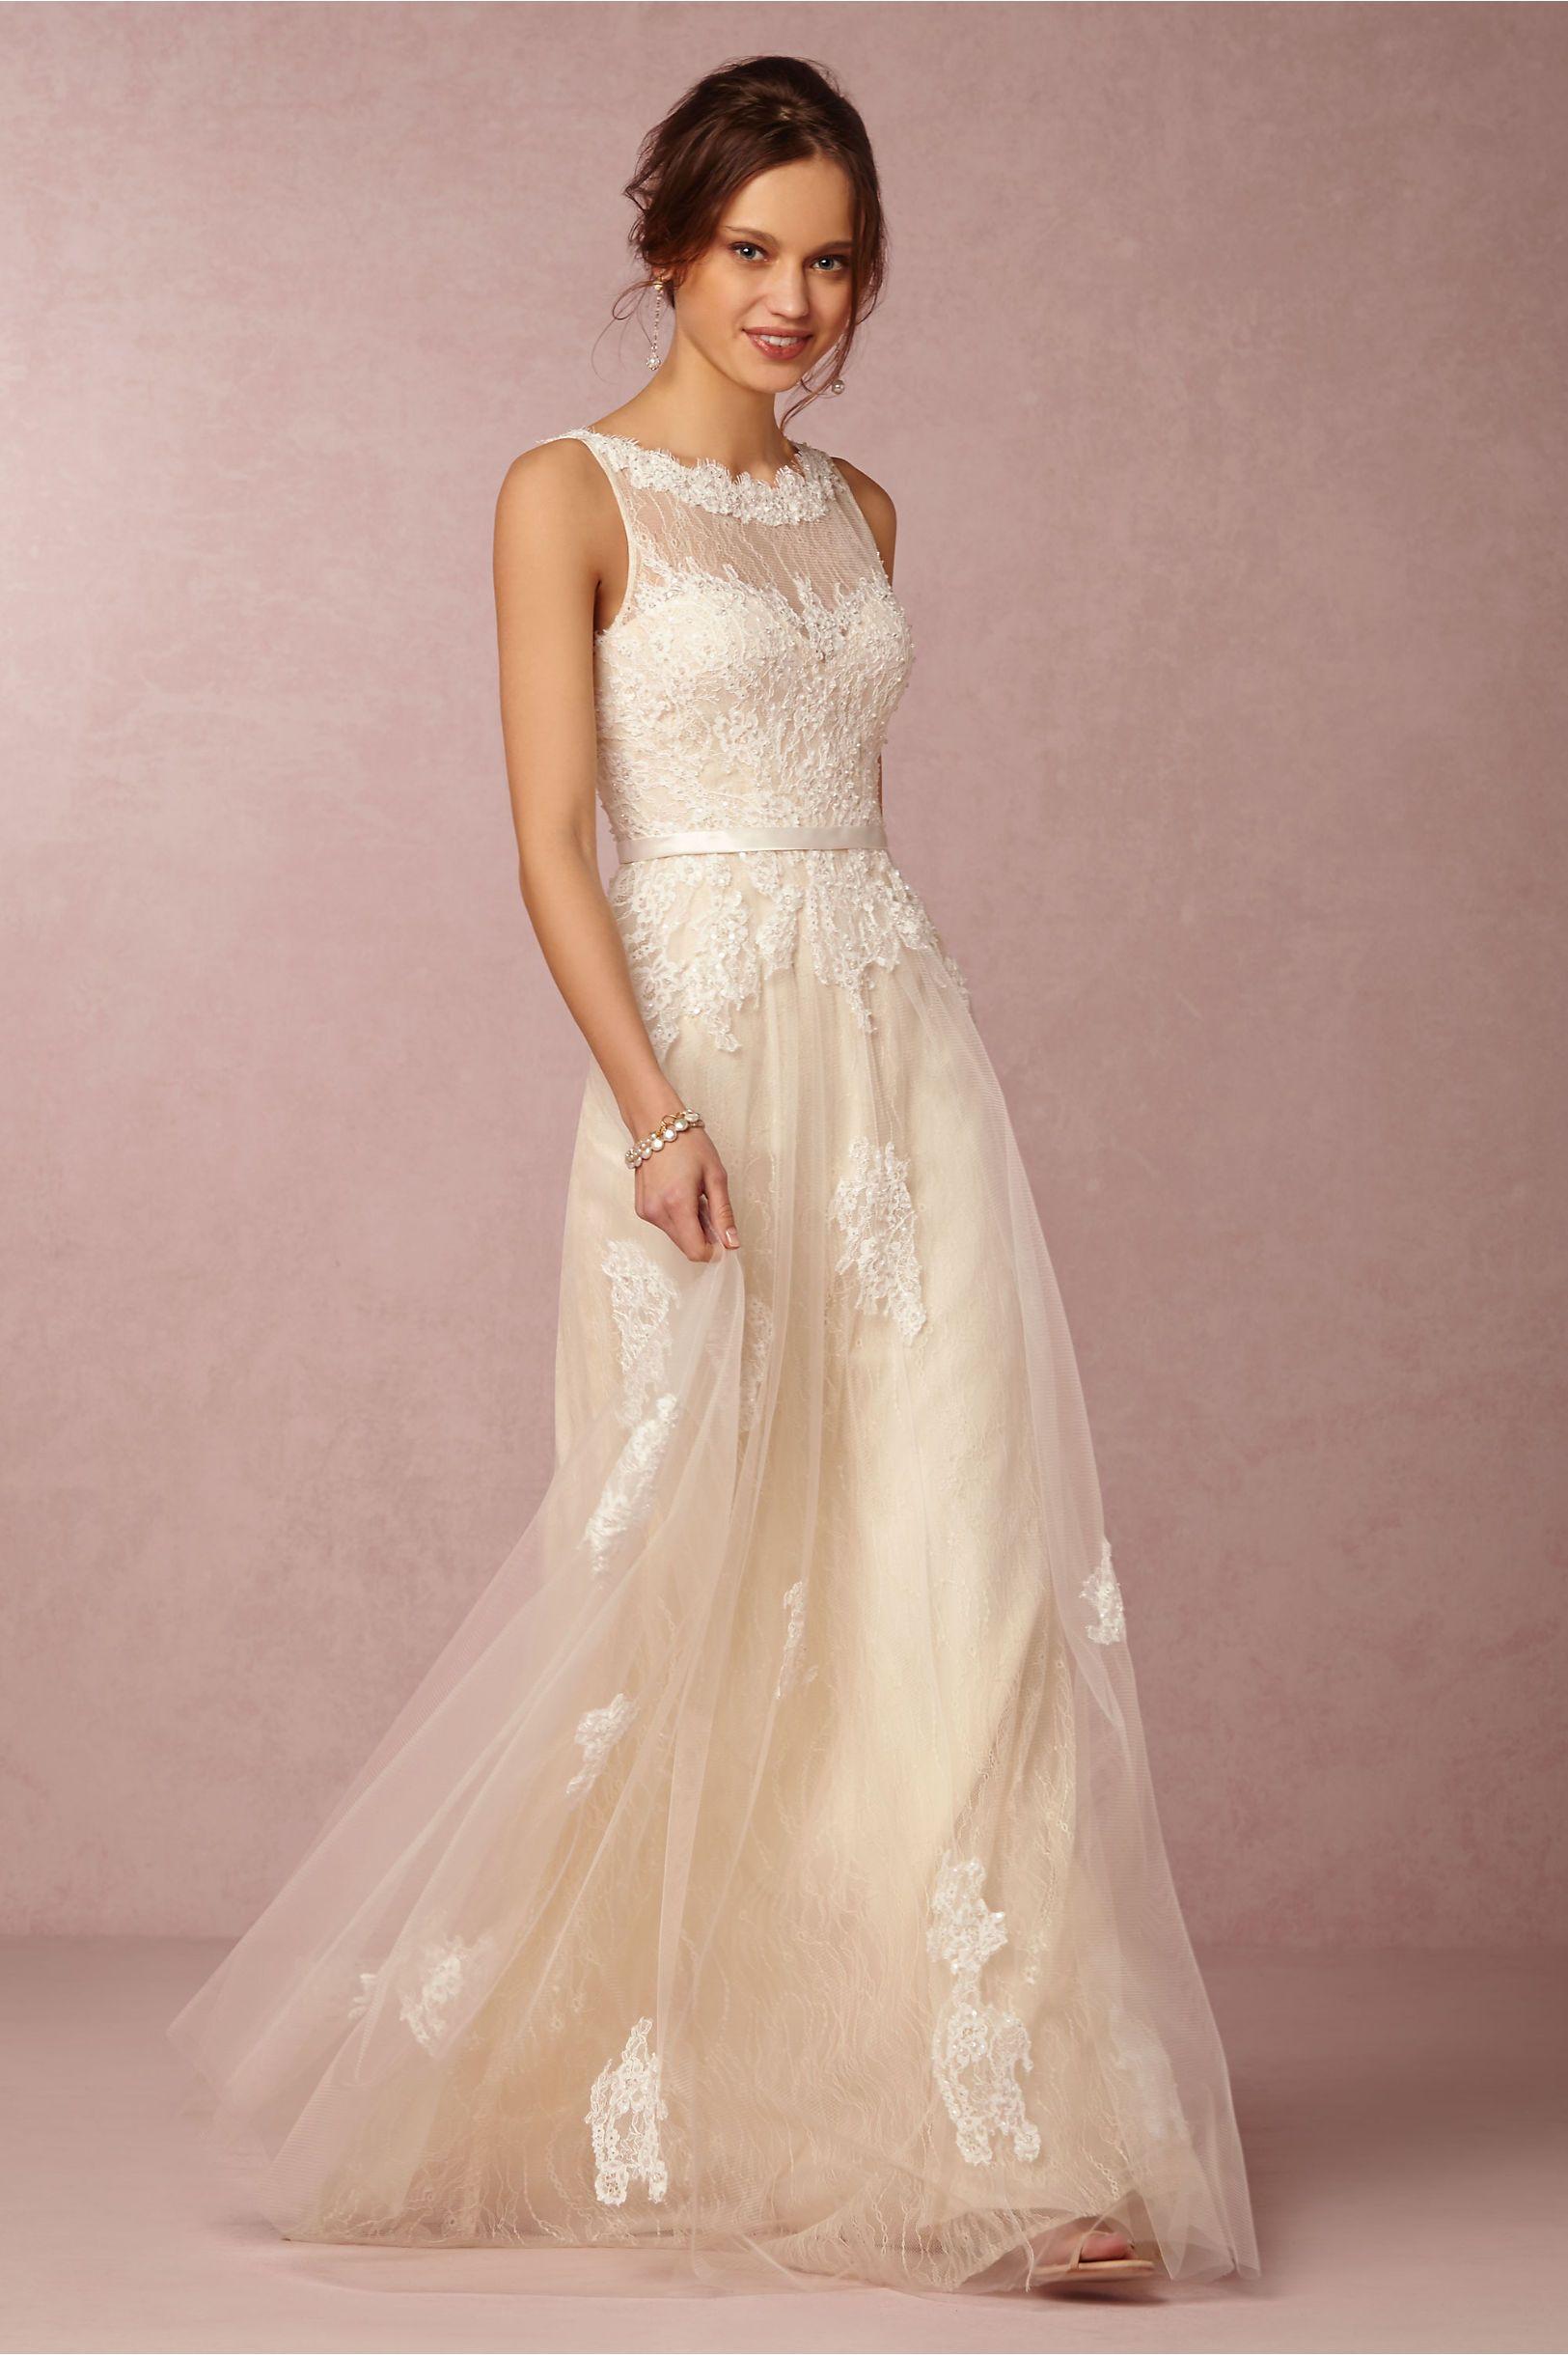 New Wedding Dresses for 2015 from BHLDN | Vestiditos y Boda